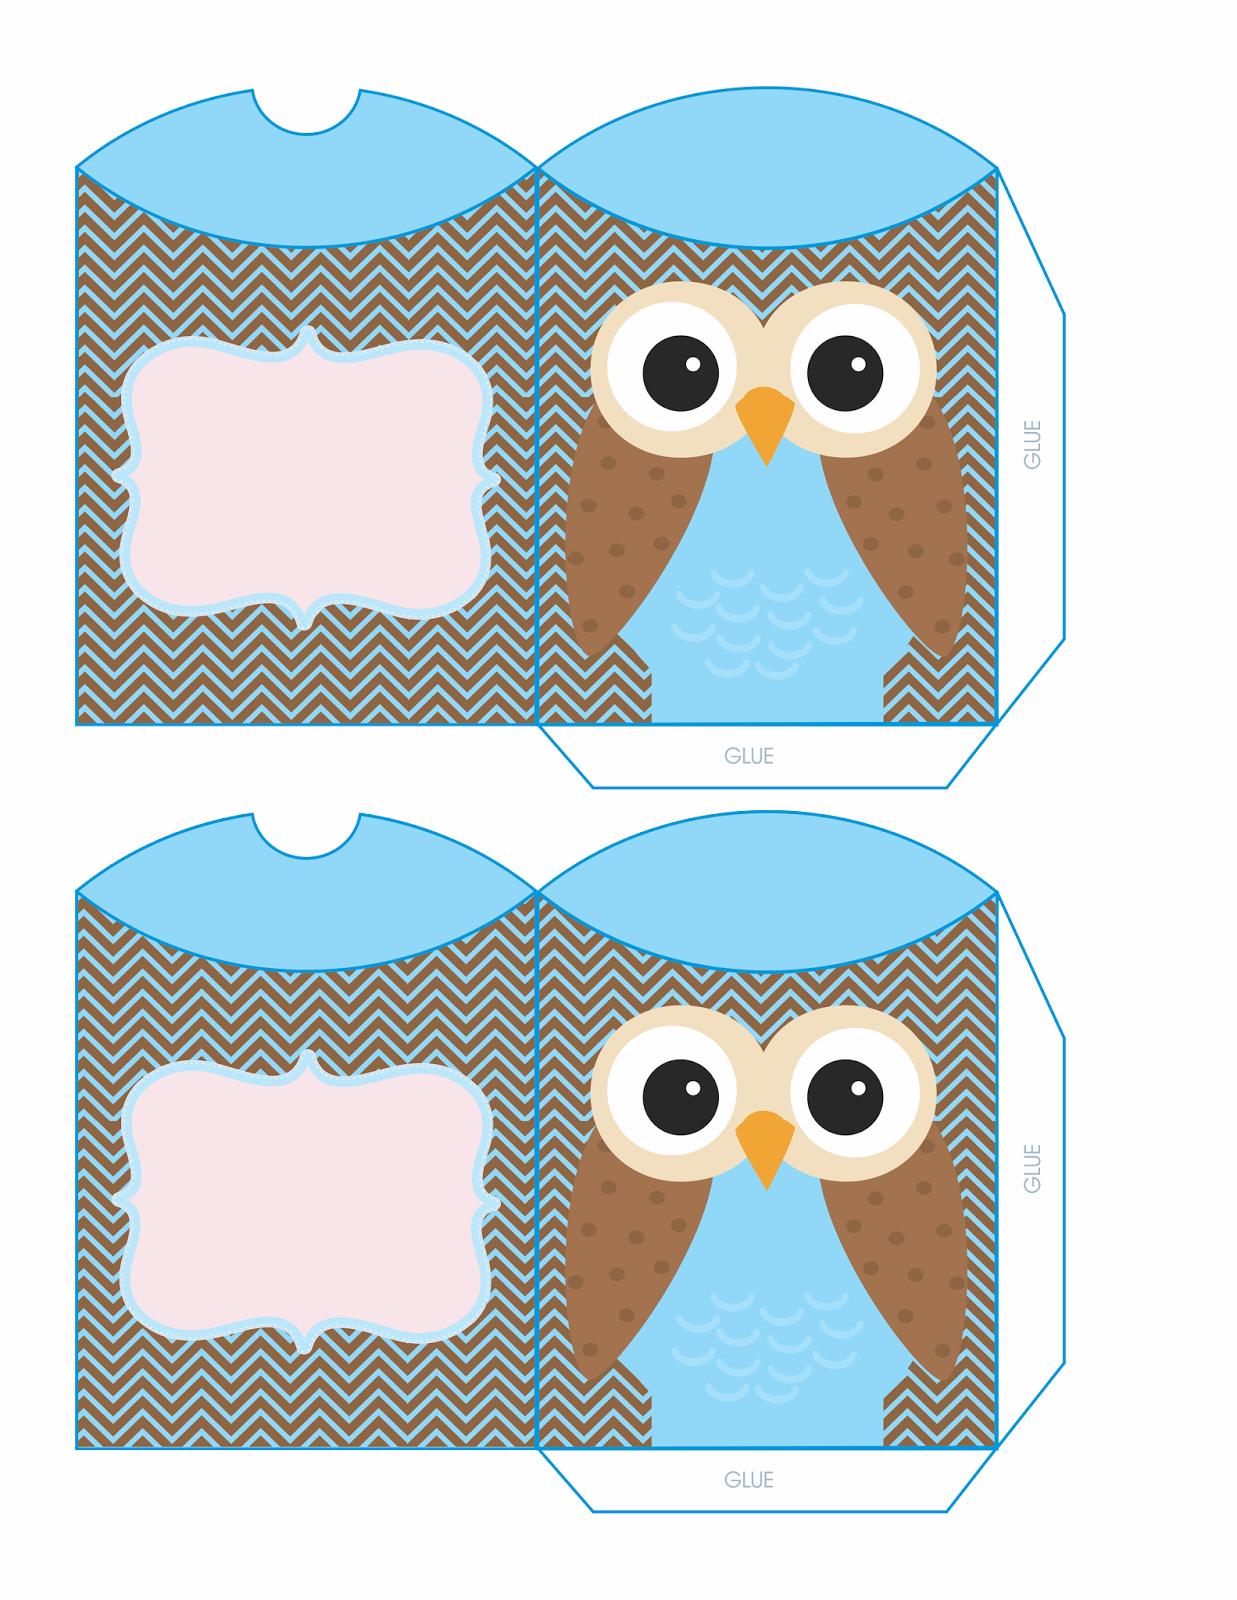 Cajas almohada con b hos para imprimir gratis oh my 15 for Owl pillow box template